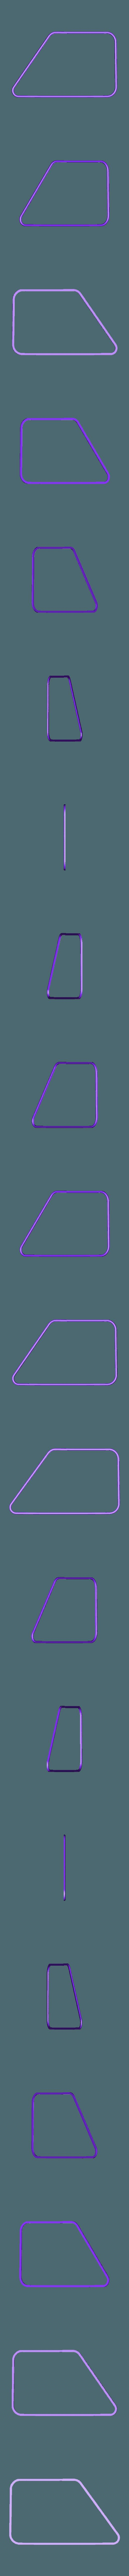 Windows_SideProfile.stl Descargar archivo STL CHEVY VAN G20 RC BODY SCALER AXIAL MST TRX4 RC4WD • Modelo para imprimir en 3D, ilyakapitonov